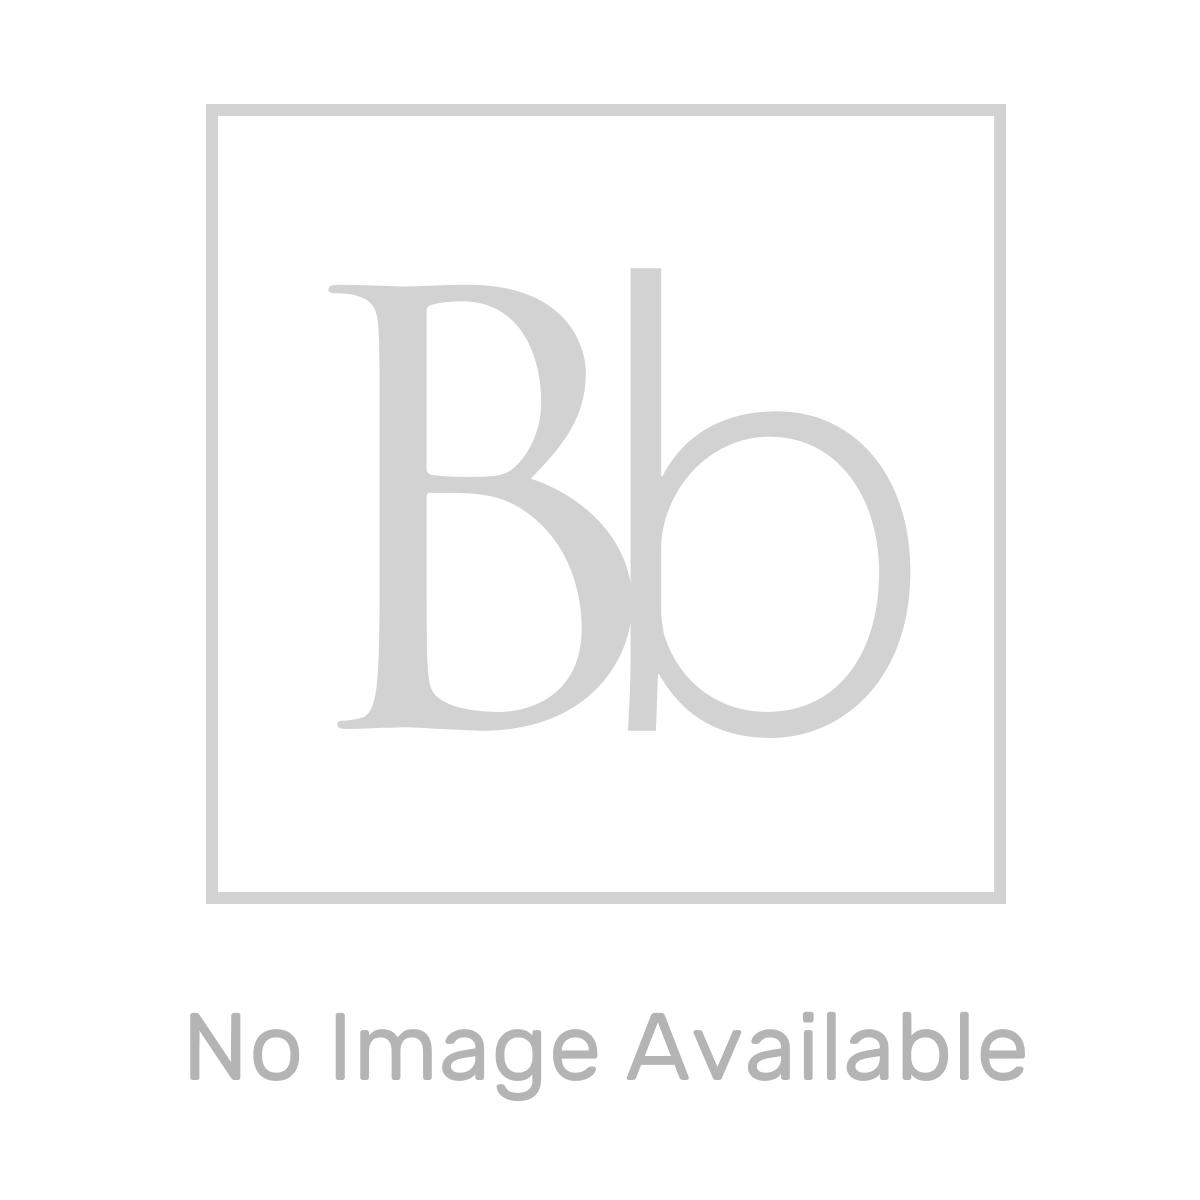 RAK Feeling Cappuccino Rectangular Shower Tray 1700 x 800mm Measurements